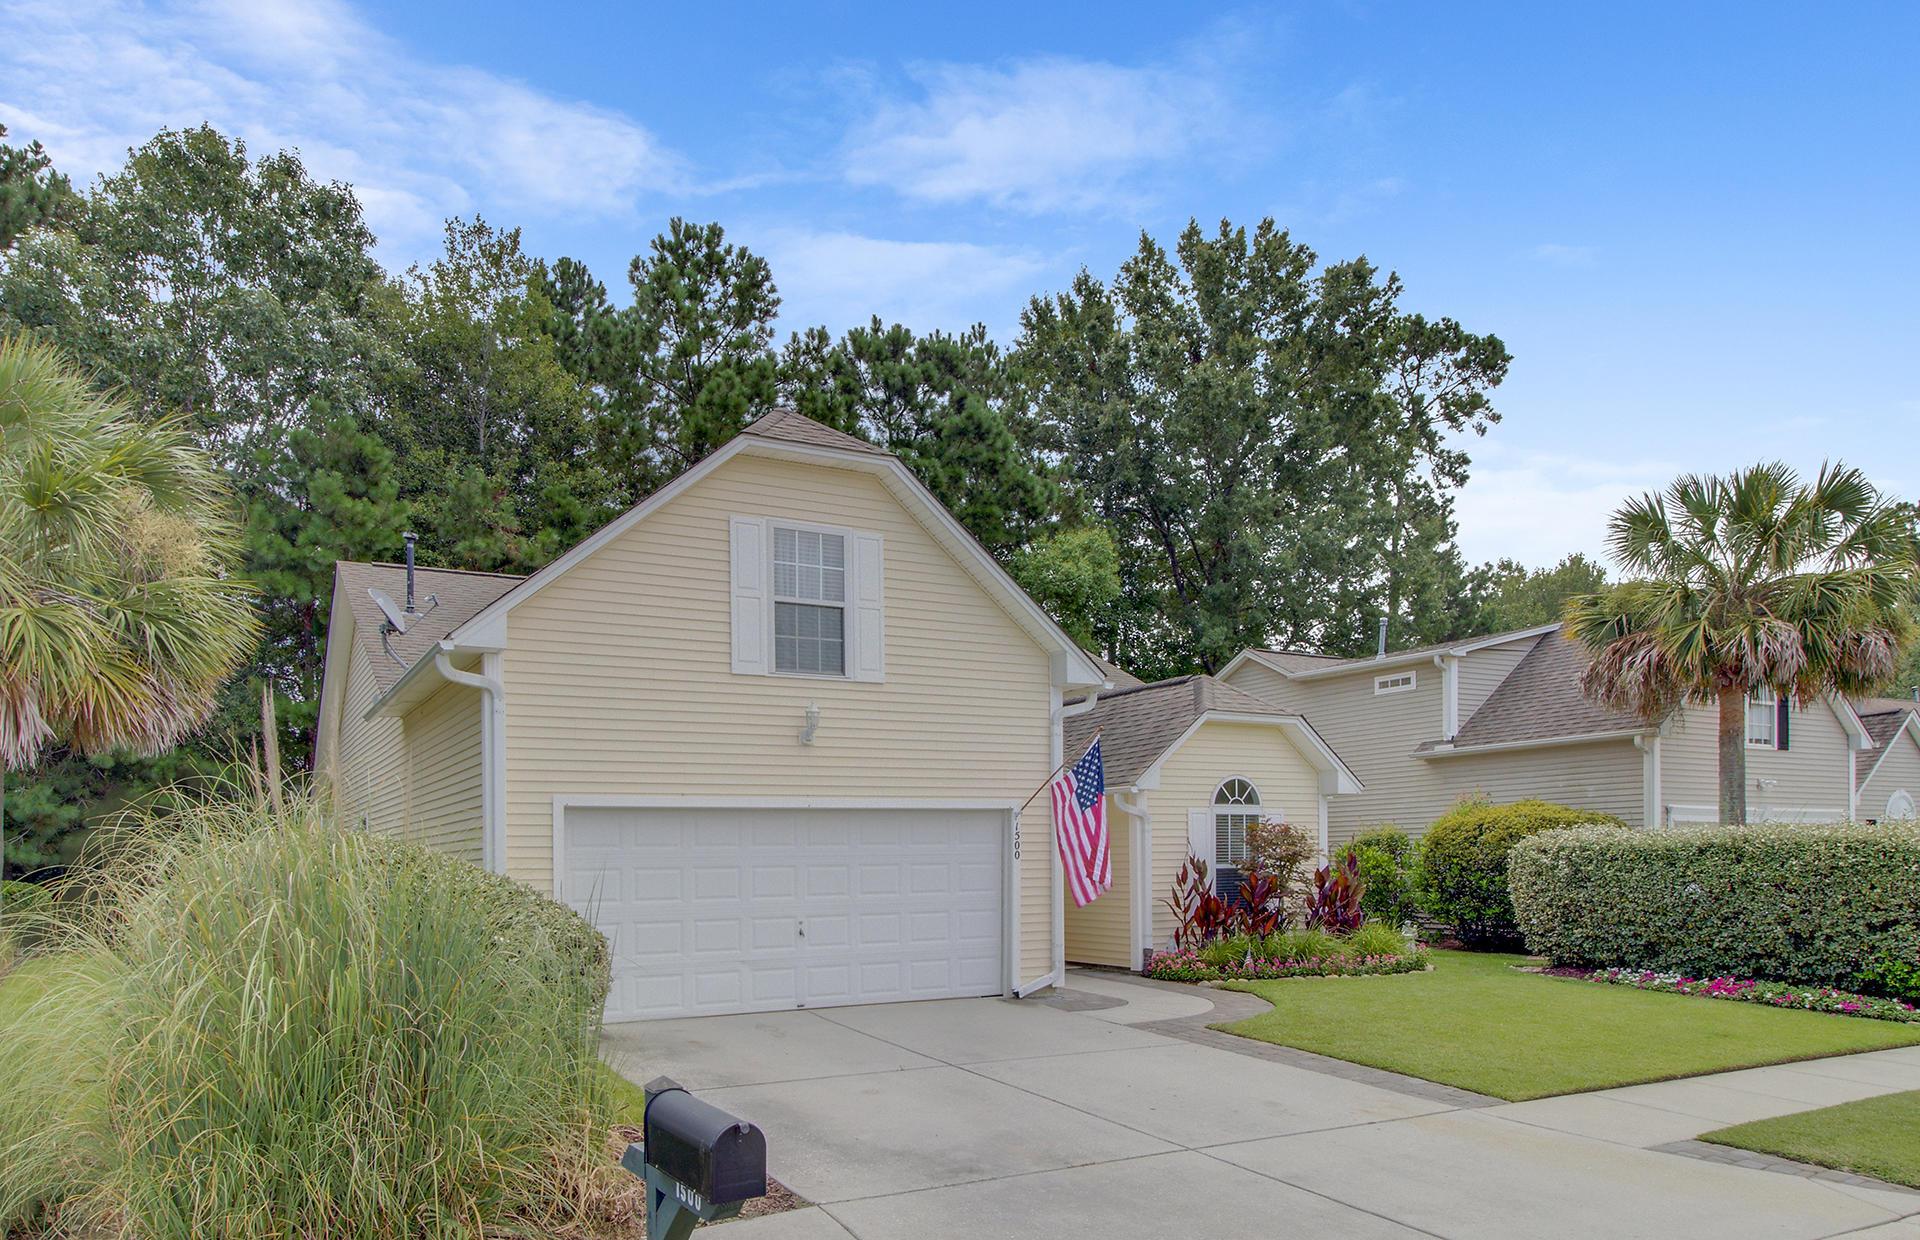 Park West Homes For Sale - 1500 Wellesley, Mount Pleasant, SC - 34